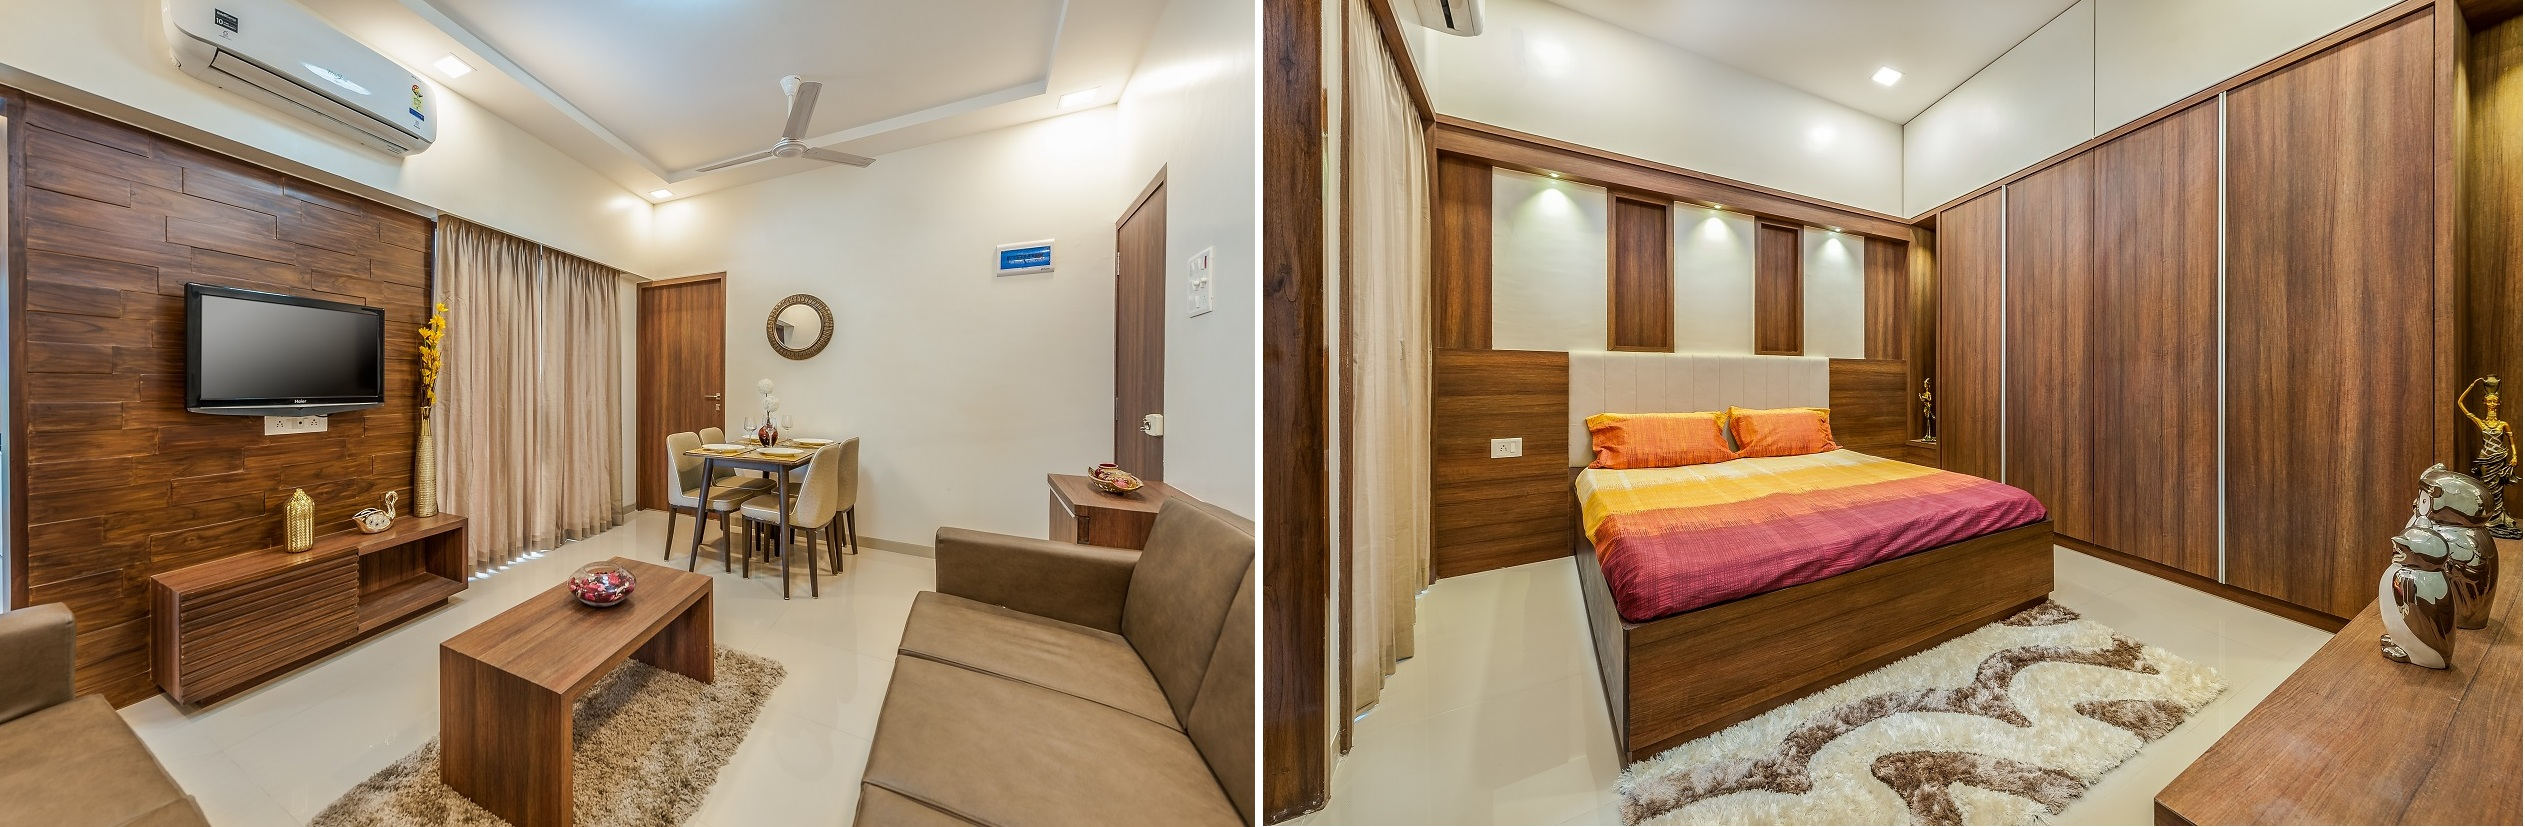 panvelkar estate greenford apartment interiors5